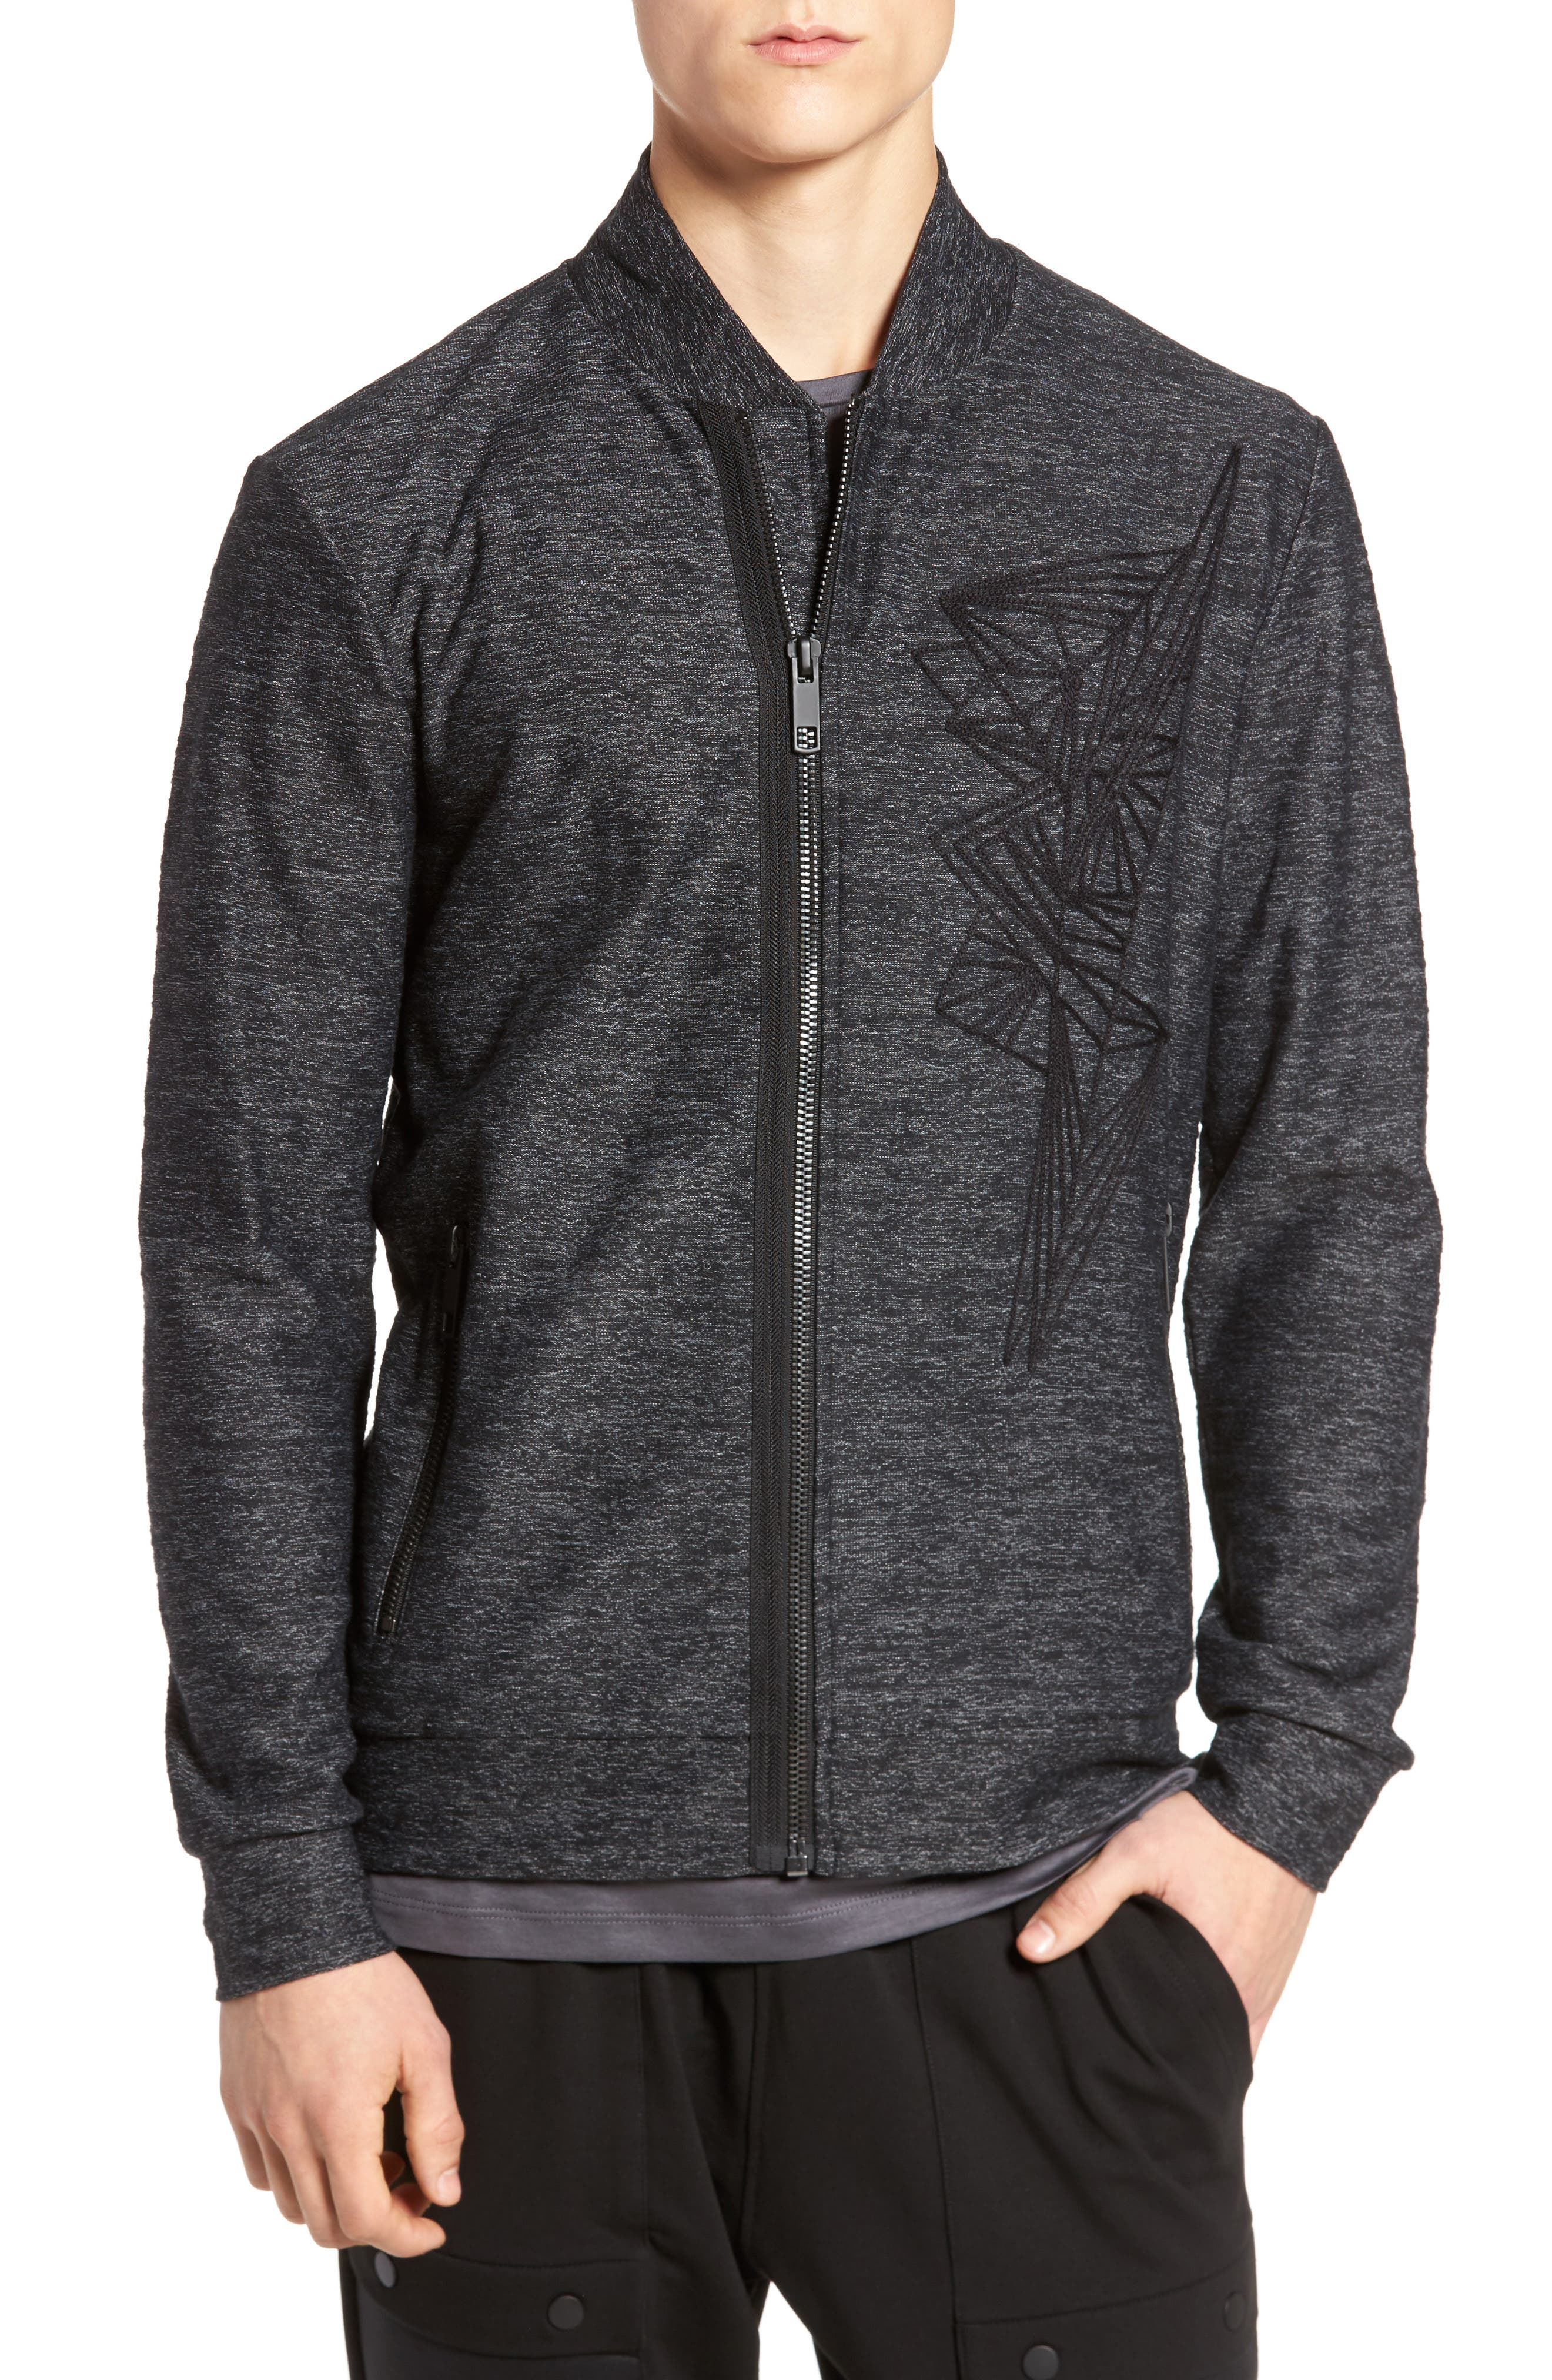 Alternate Image 1 Selected - Antony Morato Fleece Jacket